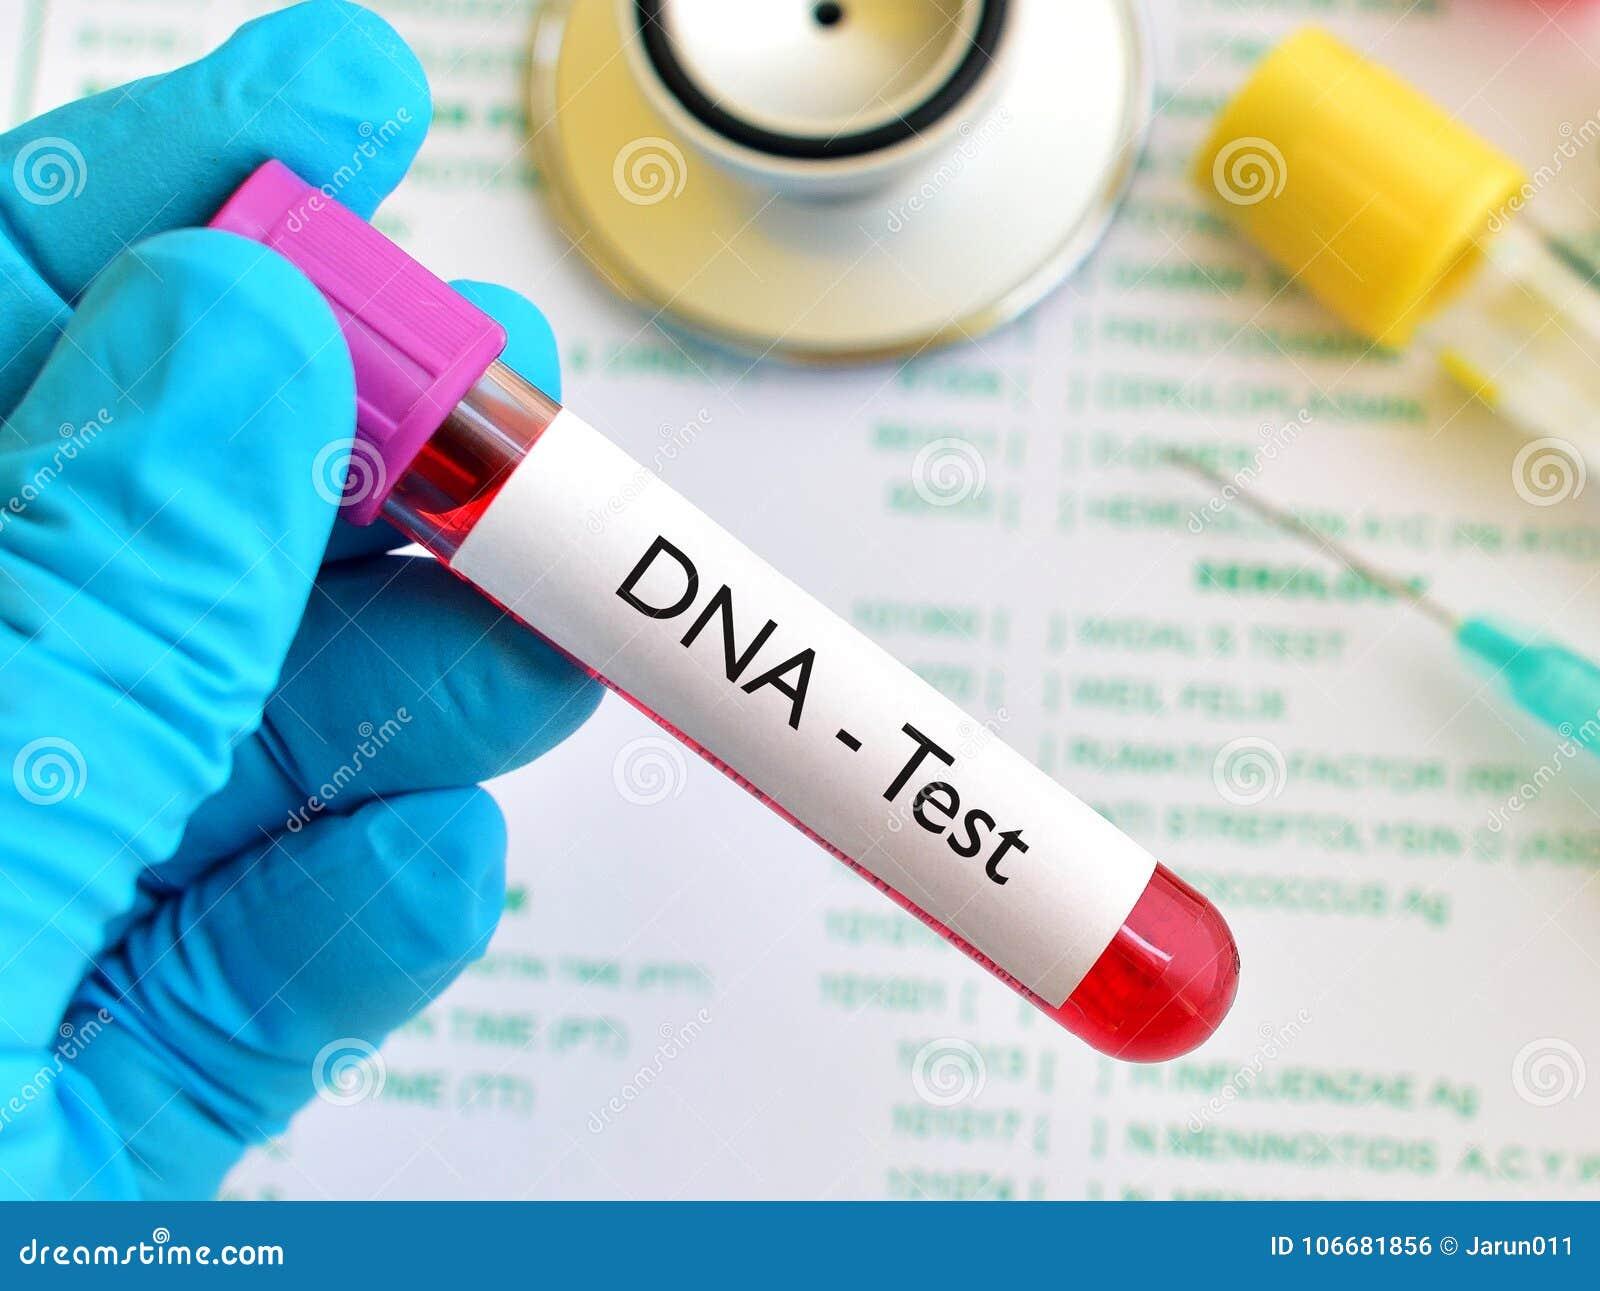 Blood for DNA test